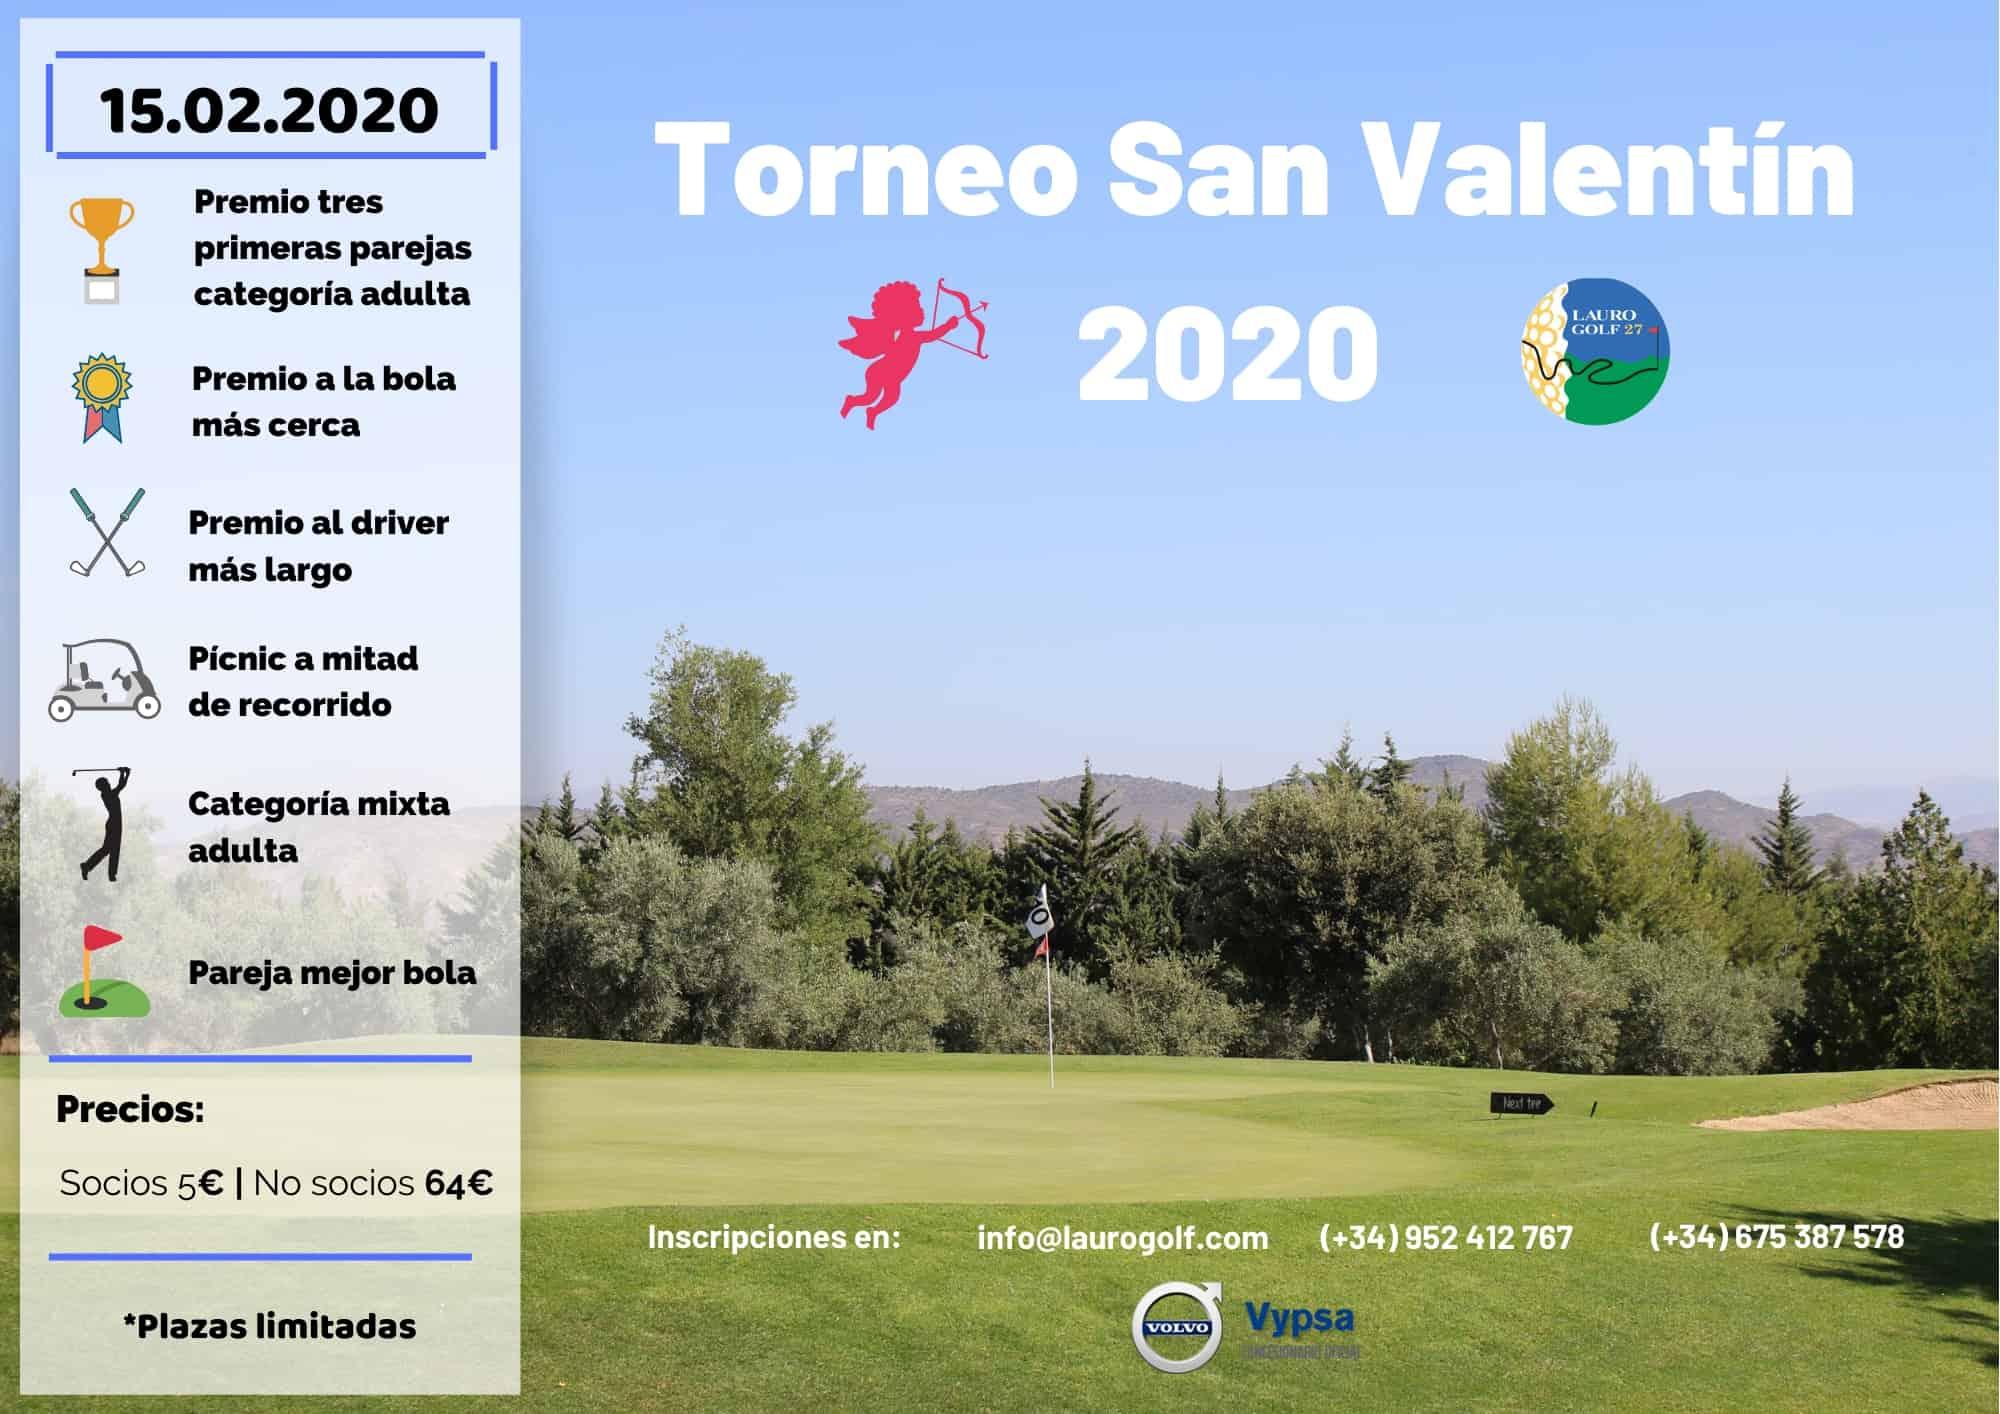 Torneo San Valentín 2020 - Lauro Golf Resort - Málaga - Costa del Sol